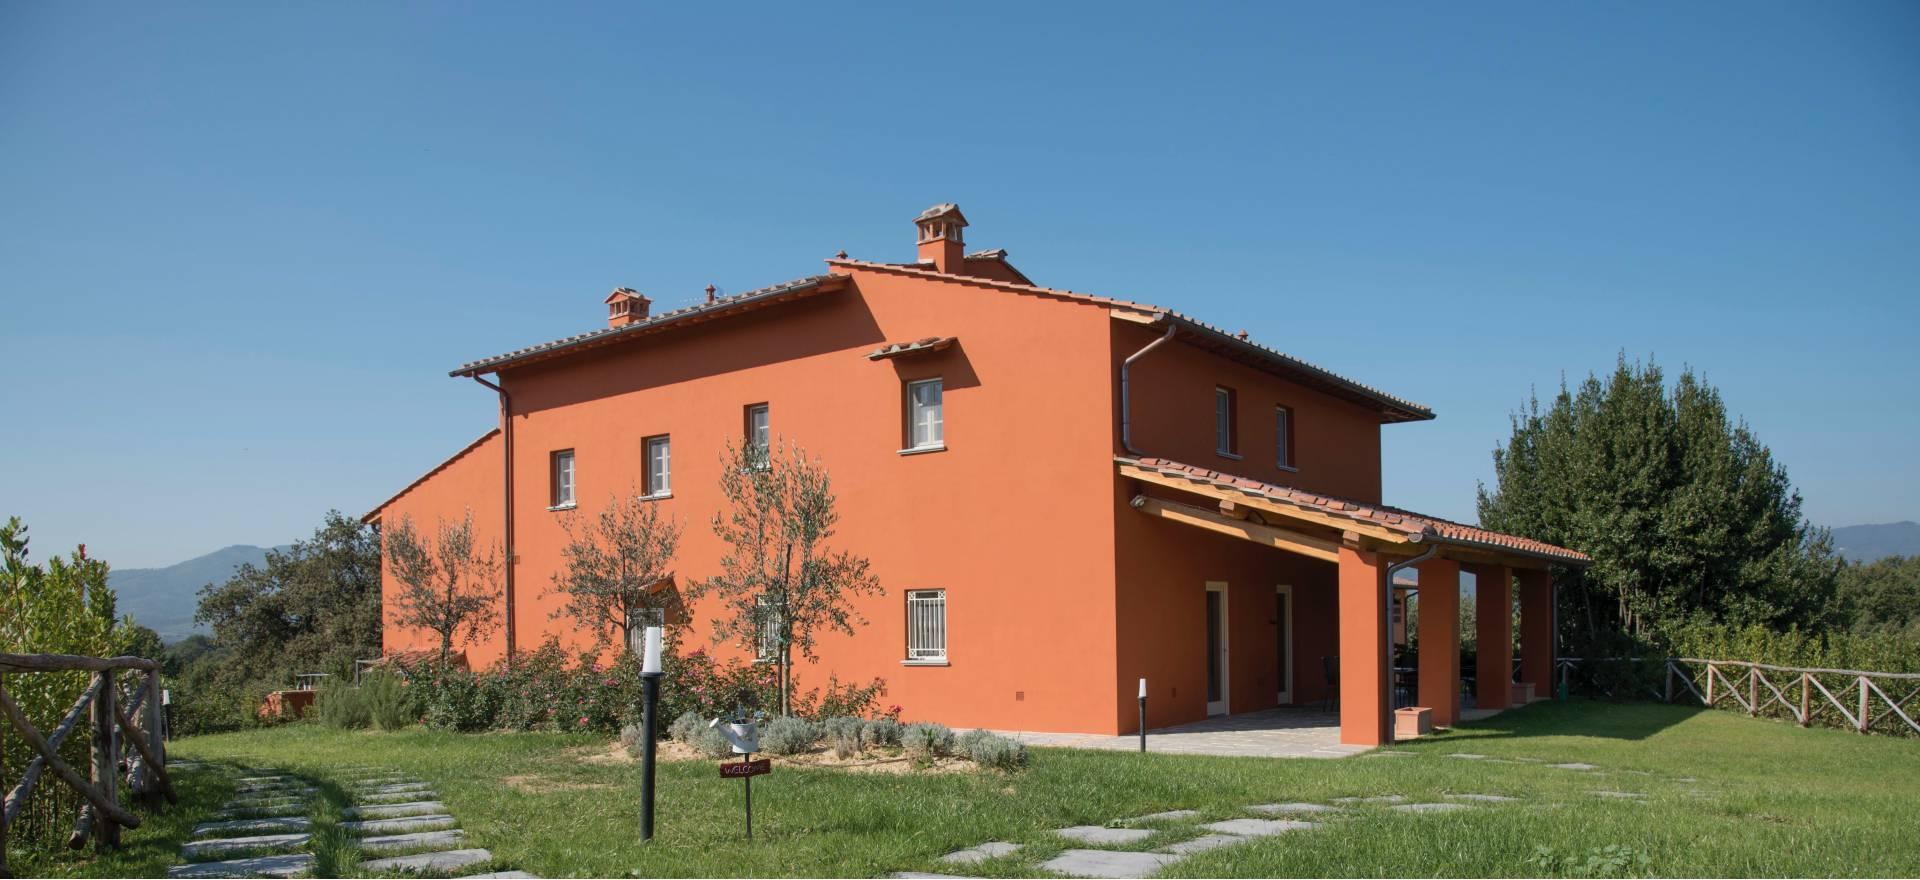 Agriturismo Toscane Agriturismo met design interieur in Toscane